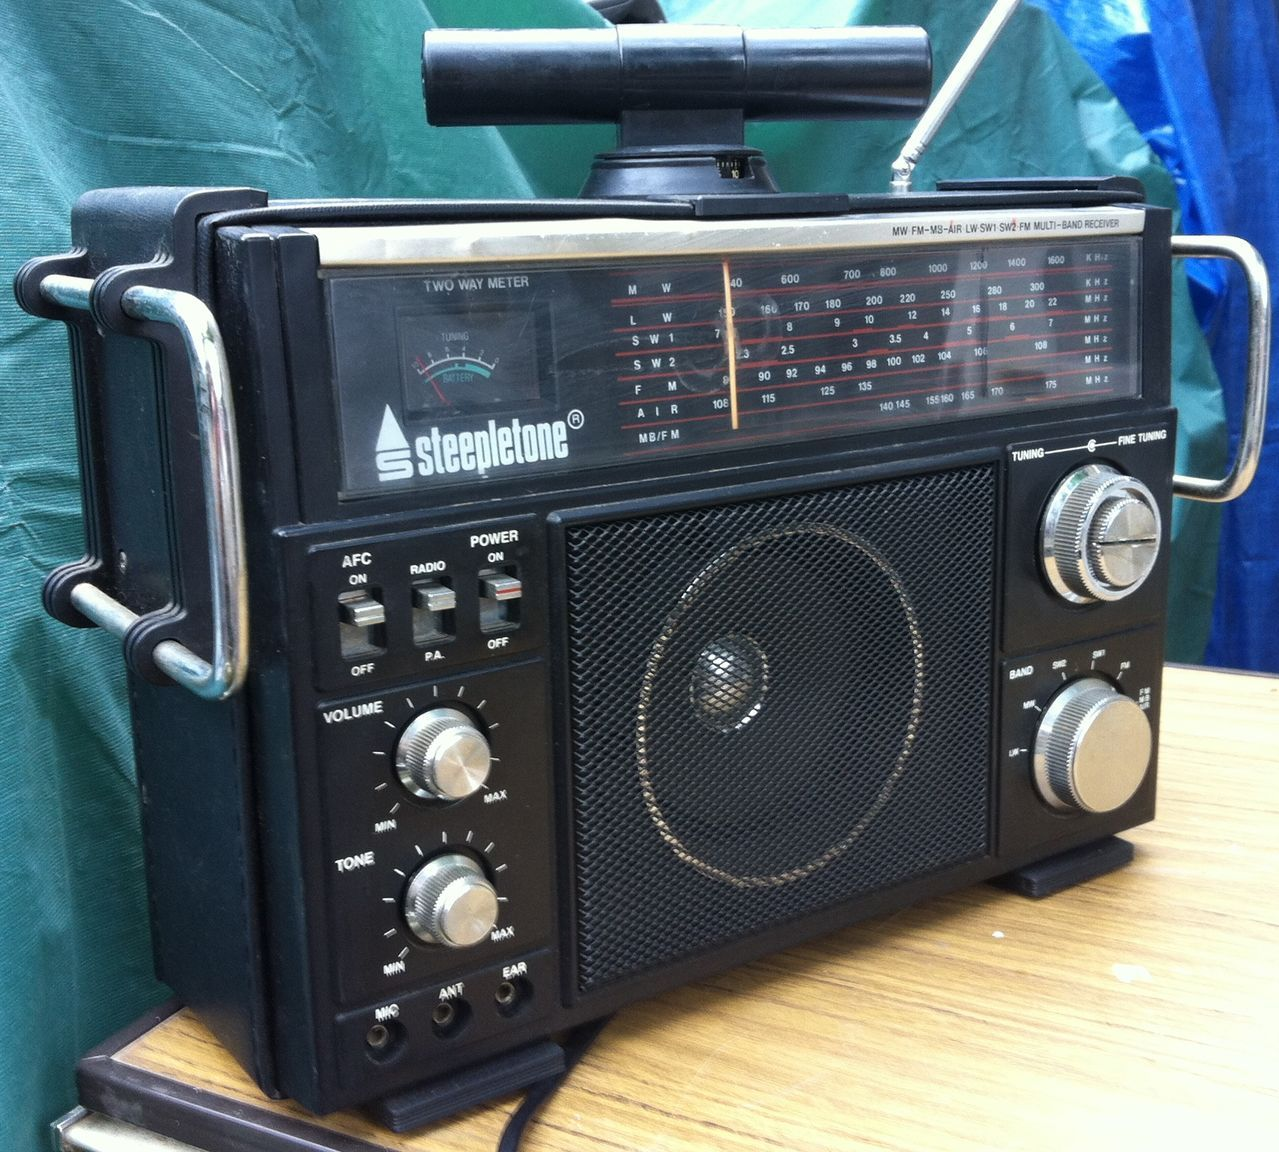 Steepletone Multi Band Receiver Mbr 7 Mbr7 Vintage Radio Old Radios Antique Radio